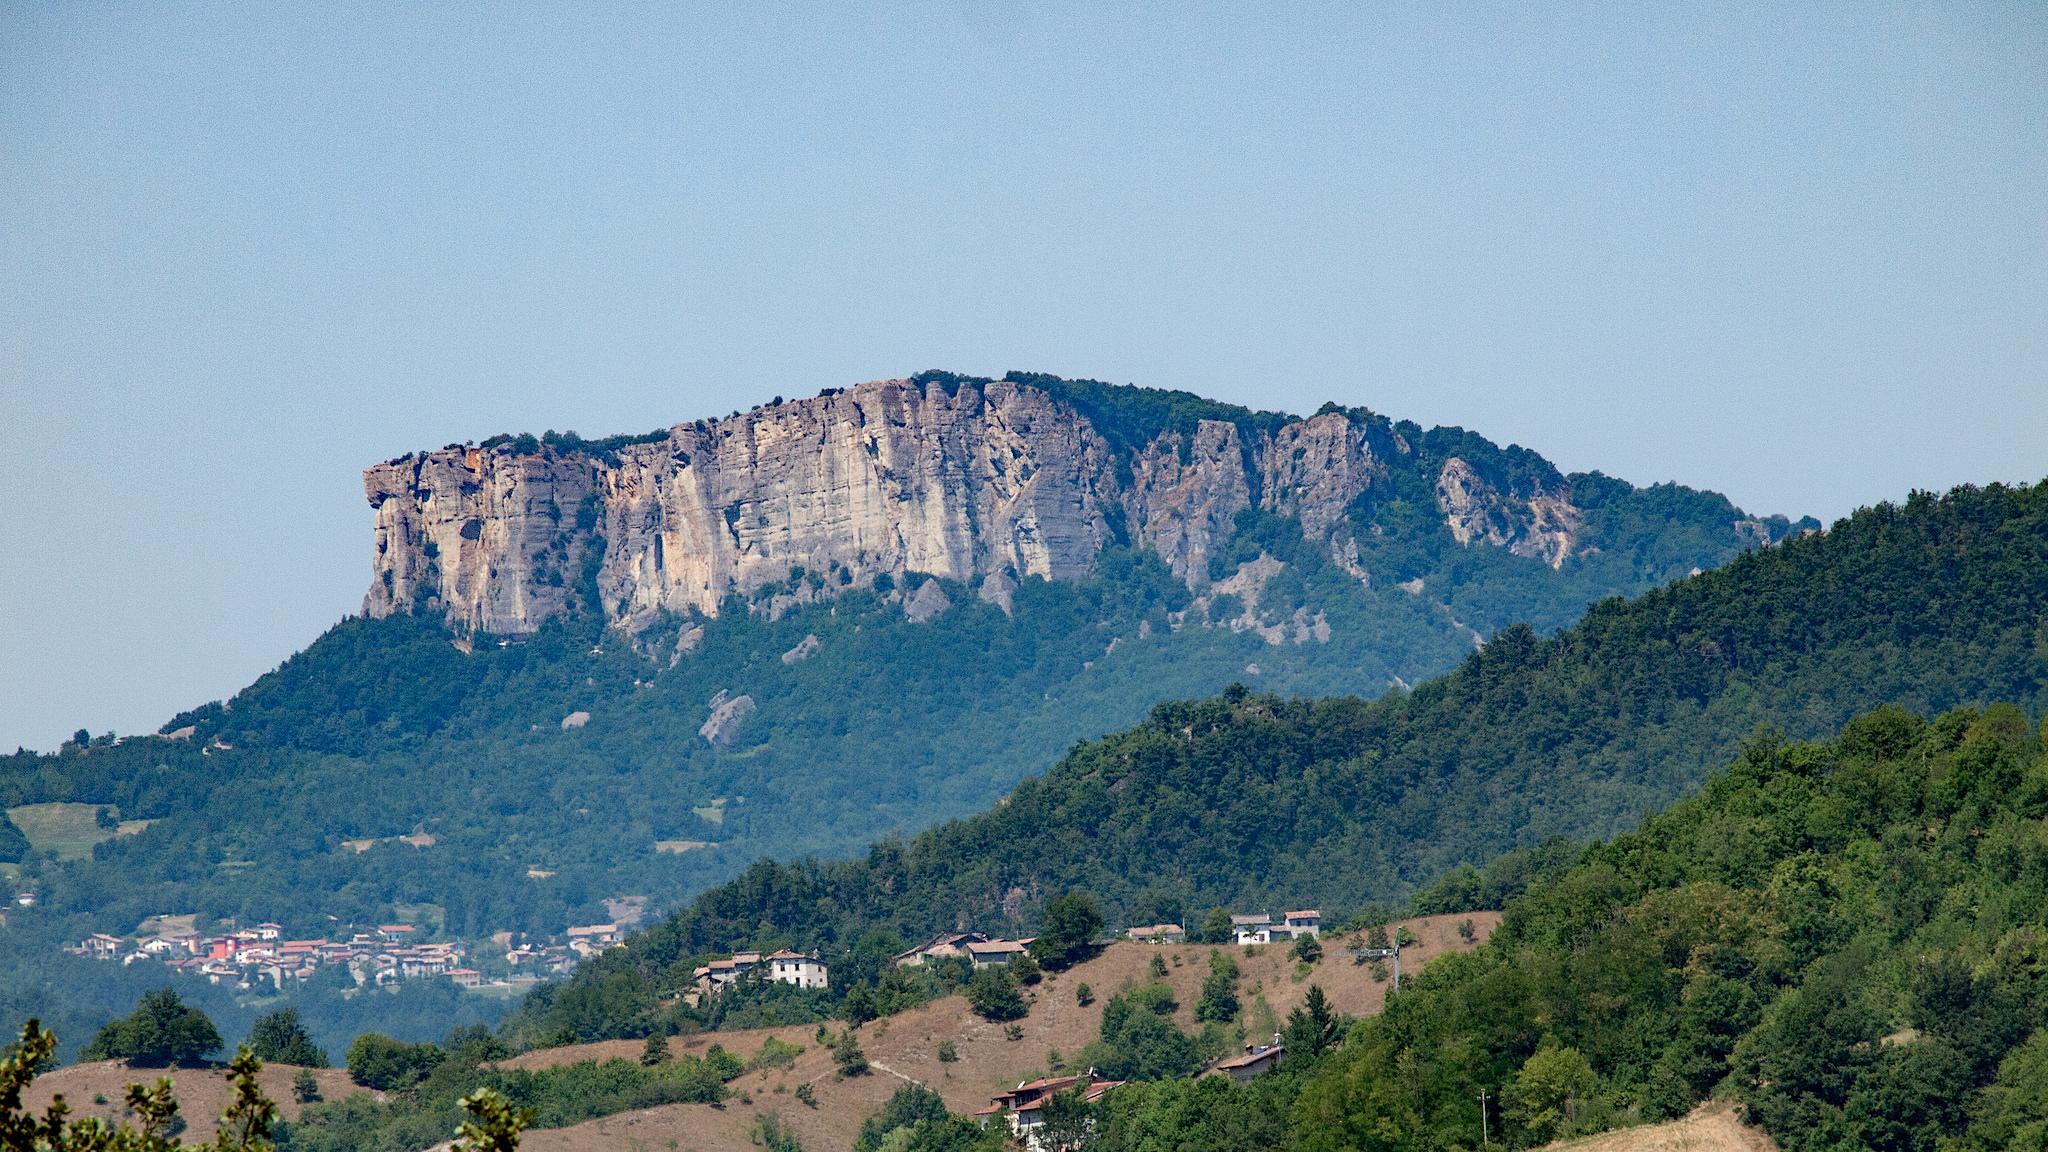 Pietra di Bismantova | Pic by Paul Barker Hemings, via Flickr